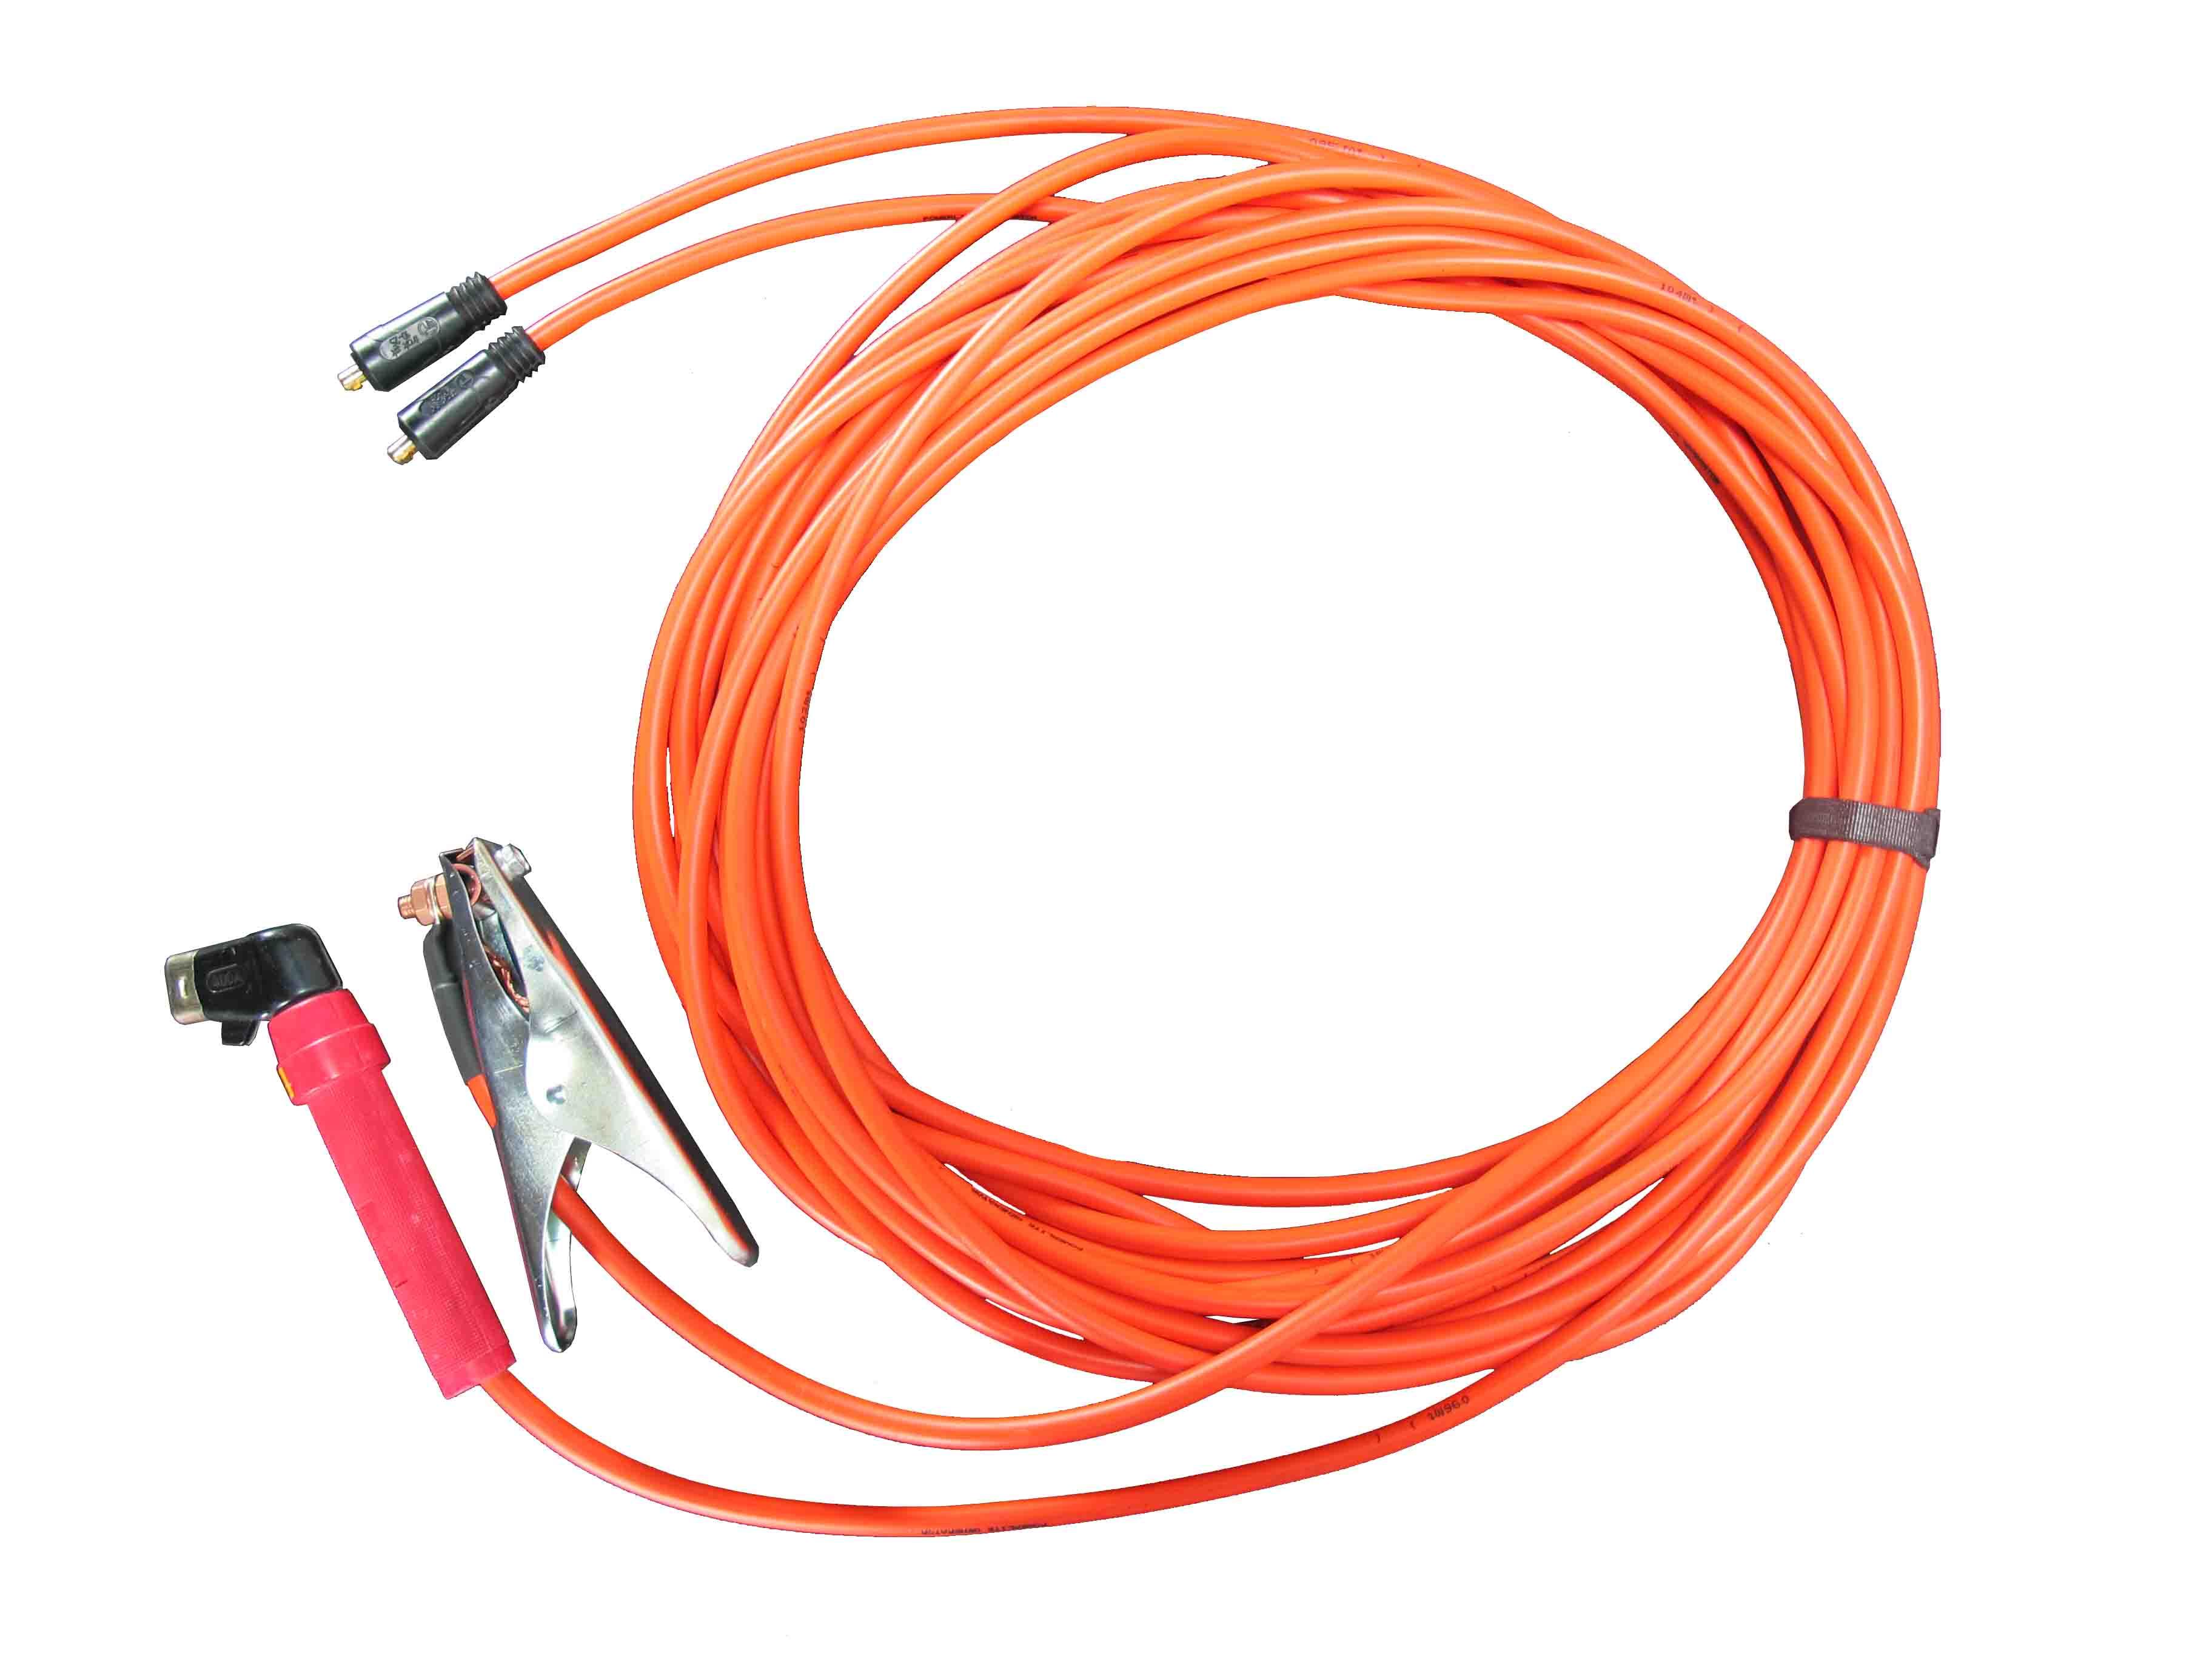 Wck Welding Cable 5m Powerlite Power Generators